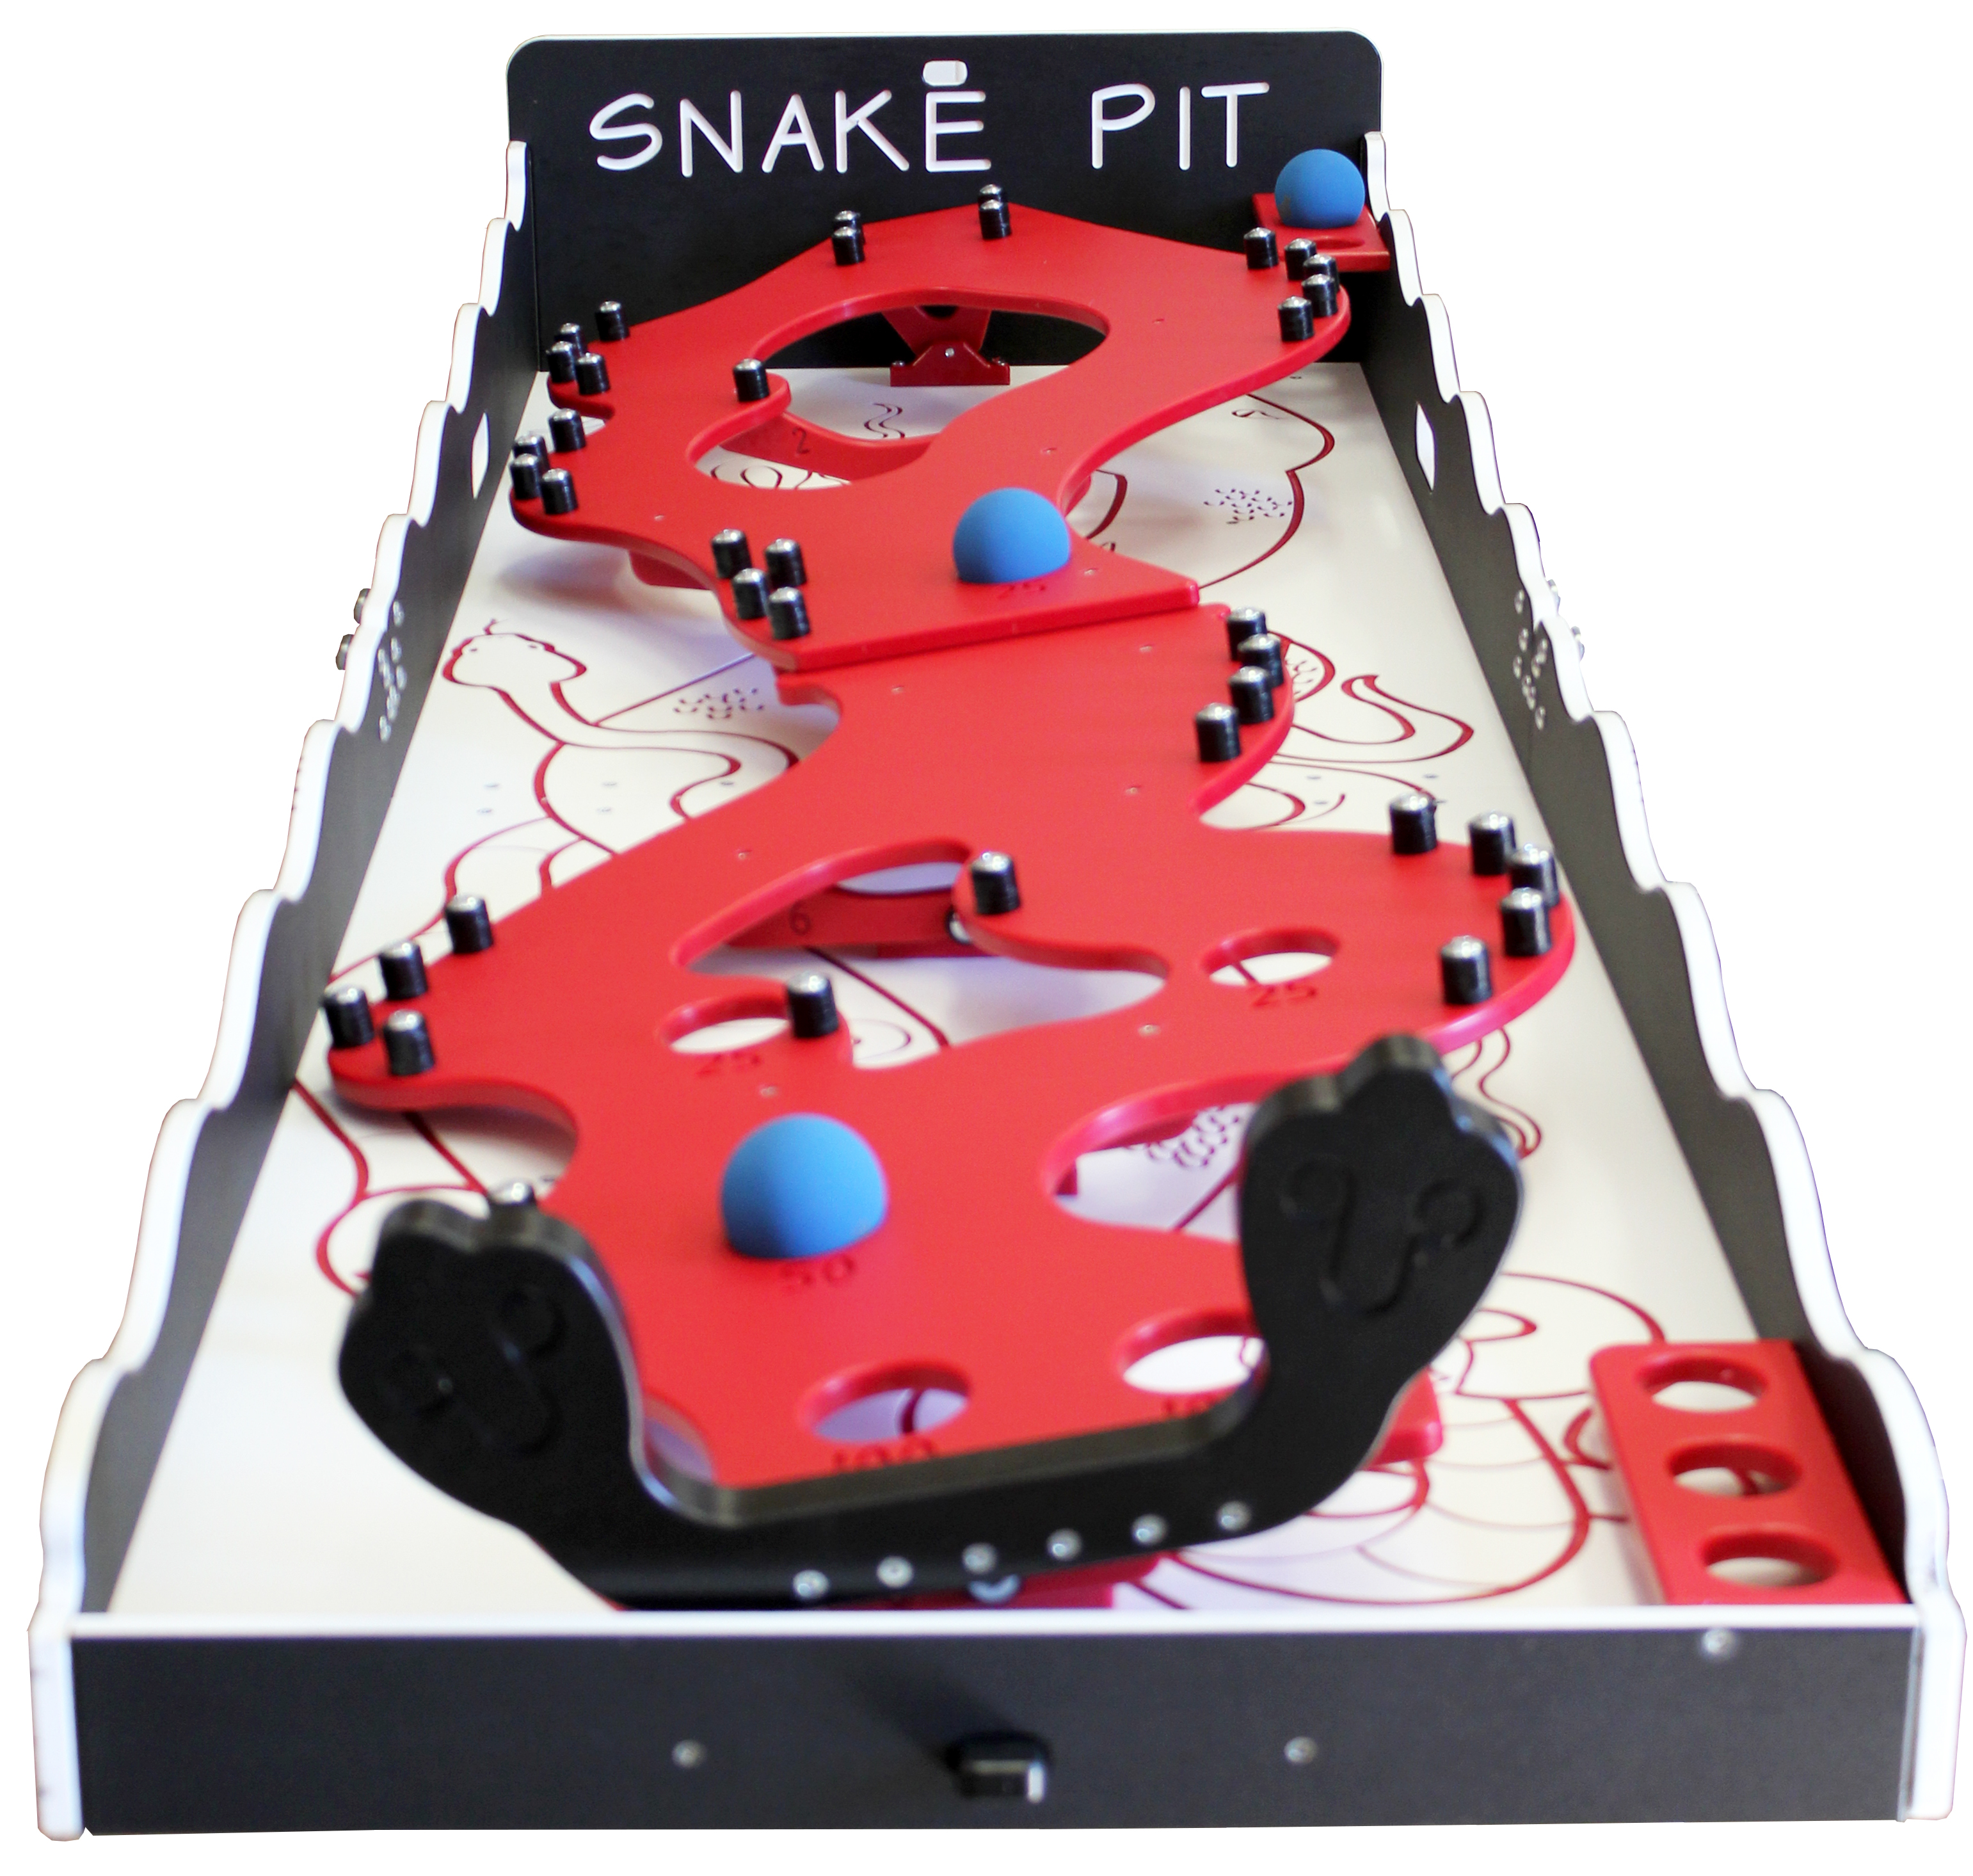 snake pit _1.jpg